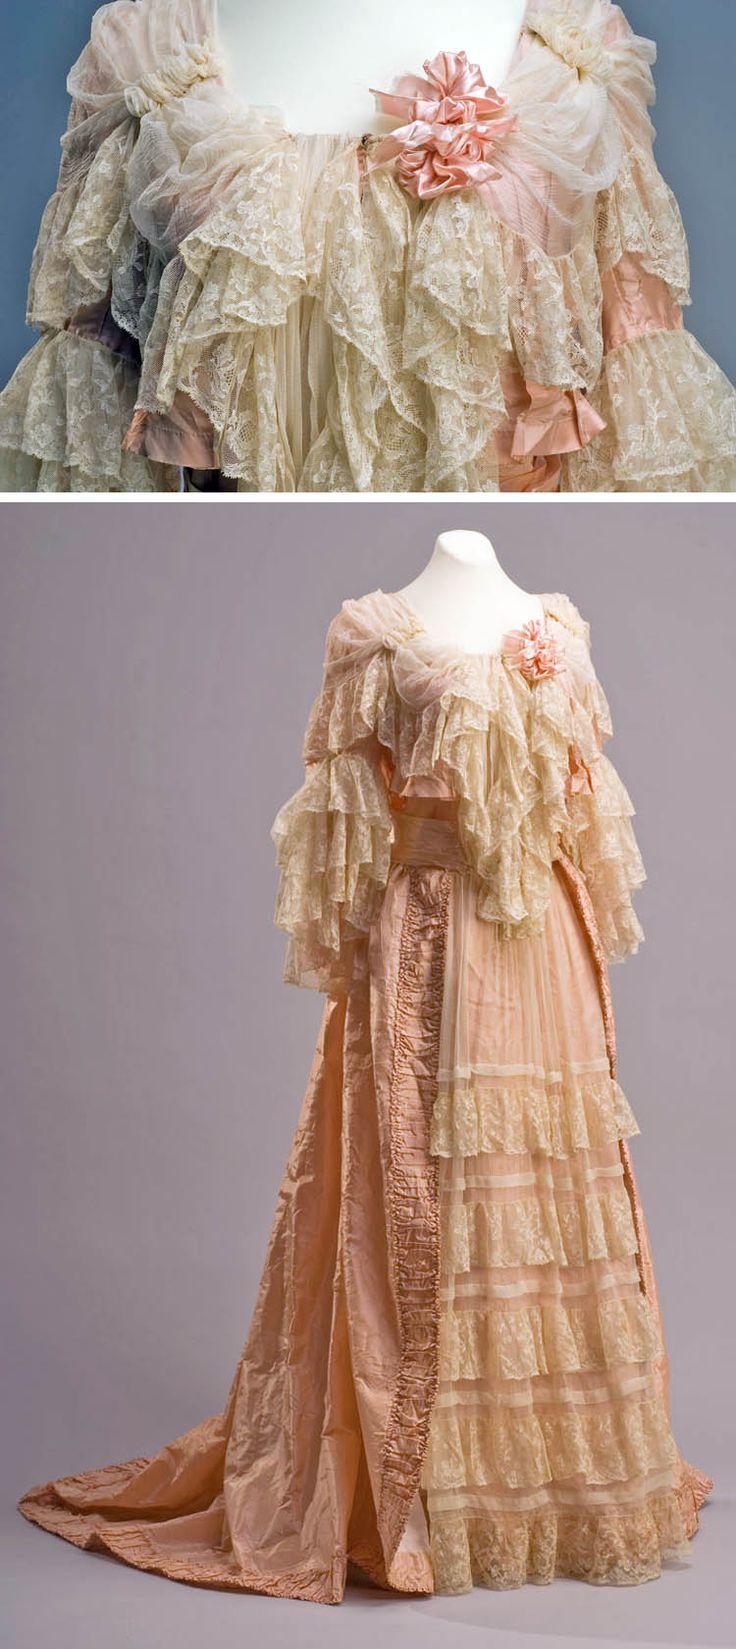 best s images on pinterest victorian fashion vintage